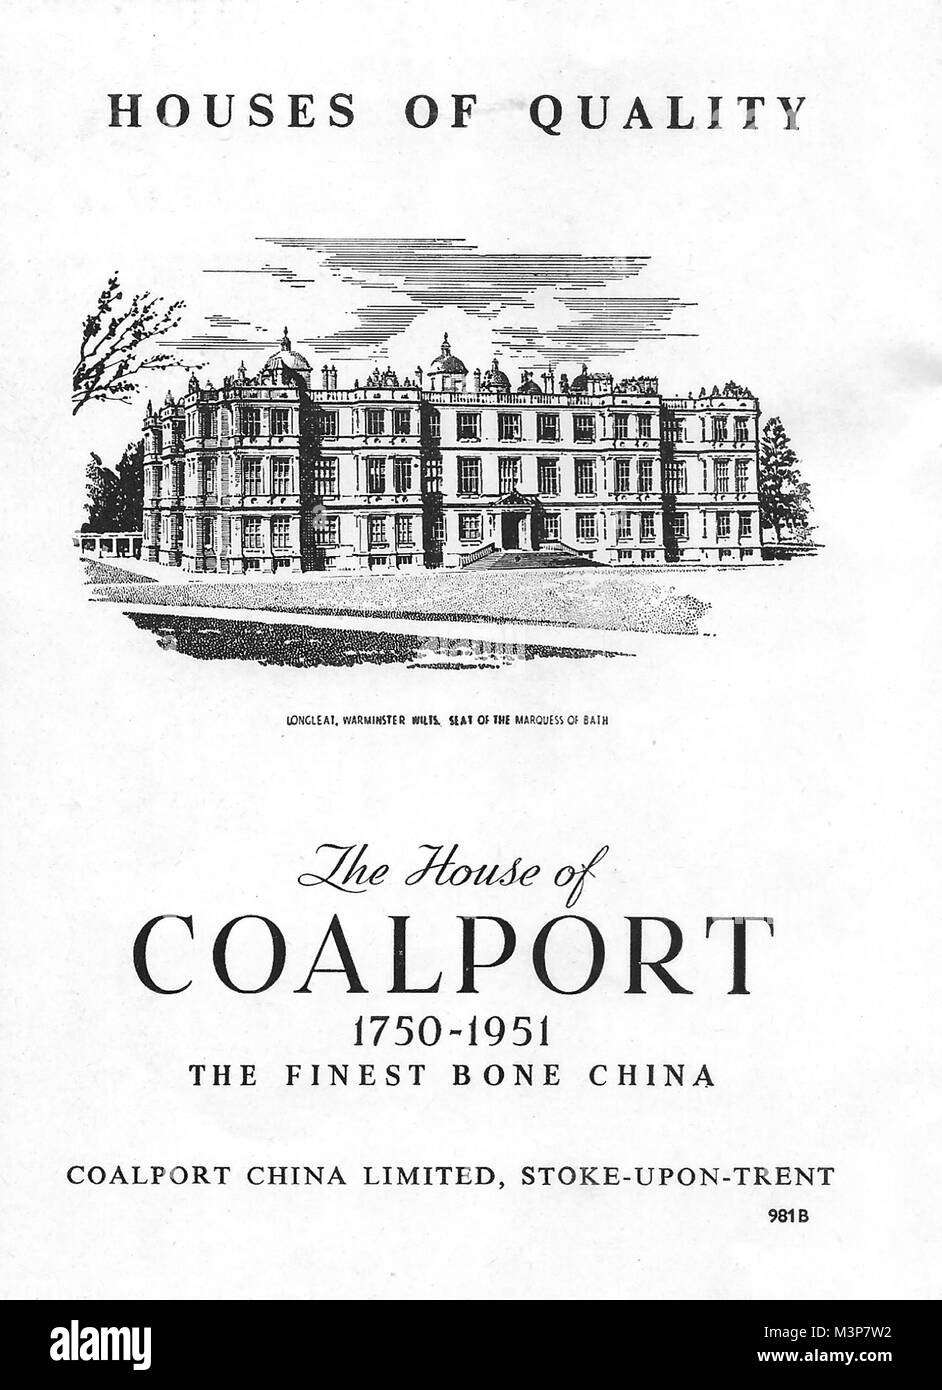 The House of Coalport finest bone china advert, advertising in Country Life magazine UK 1951 - Stock Image